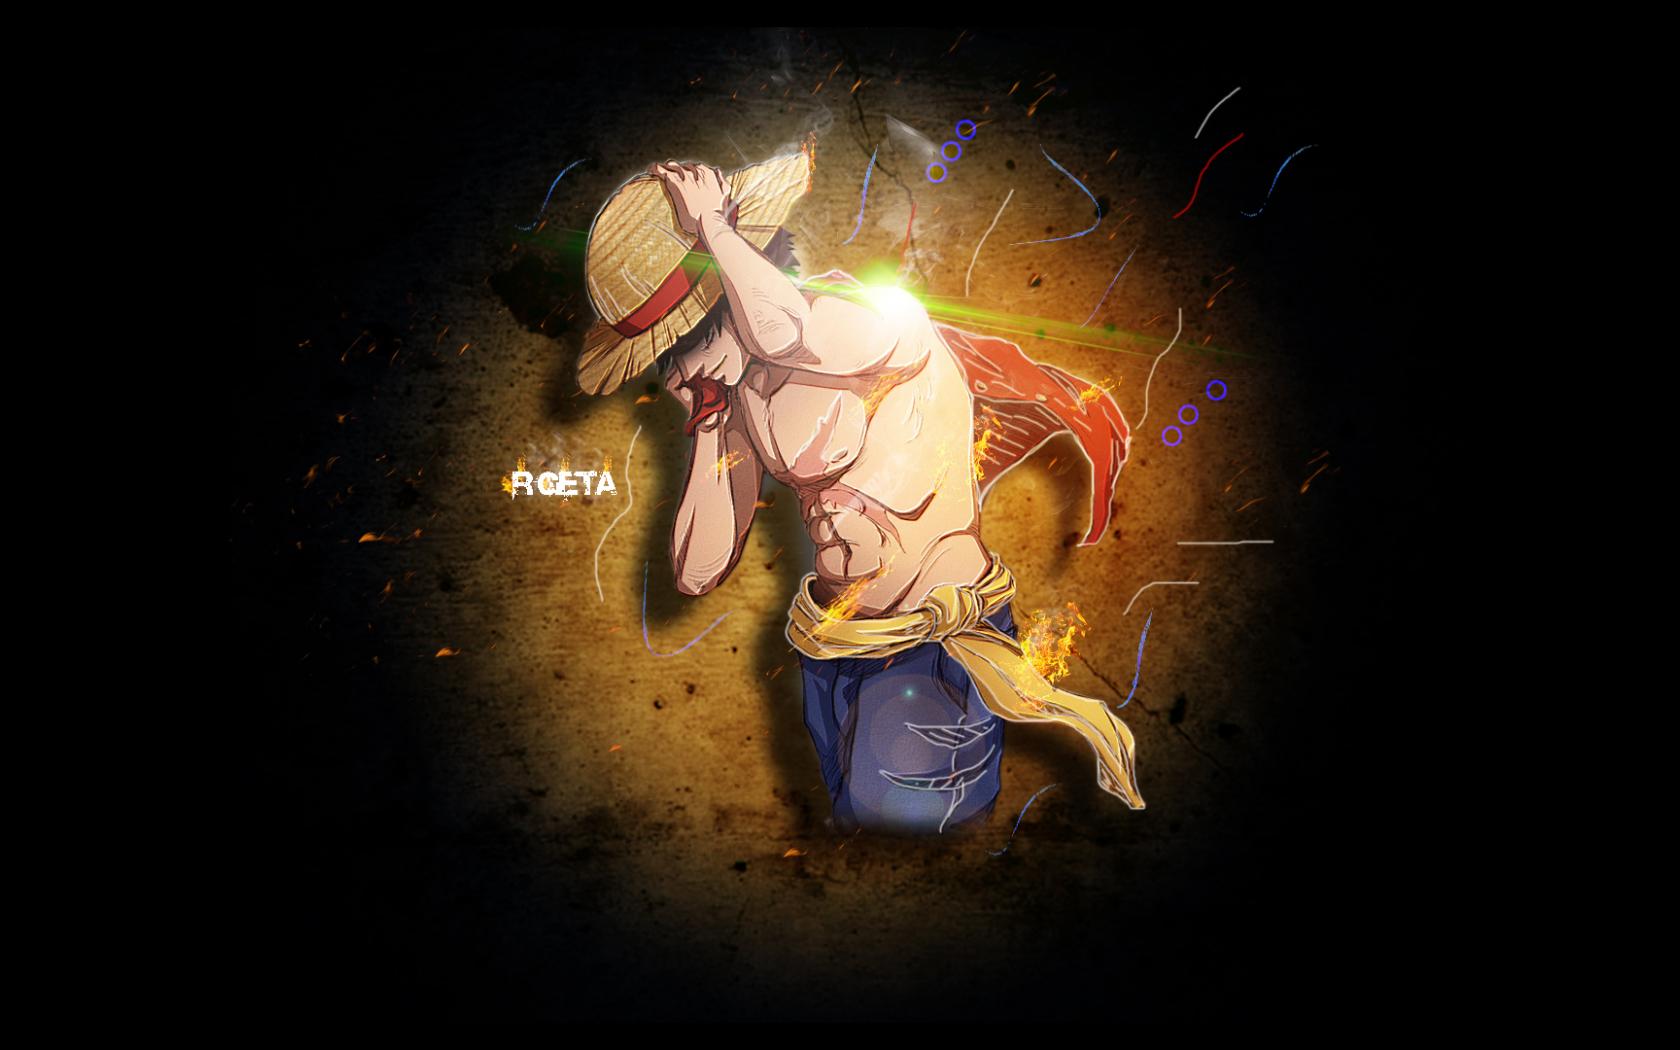 Free download monkey d luffy one piece anime hd wallpaper ...